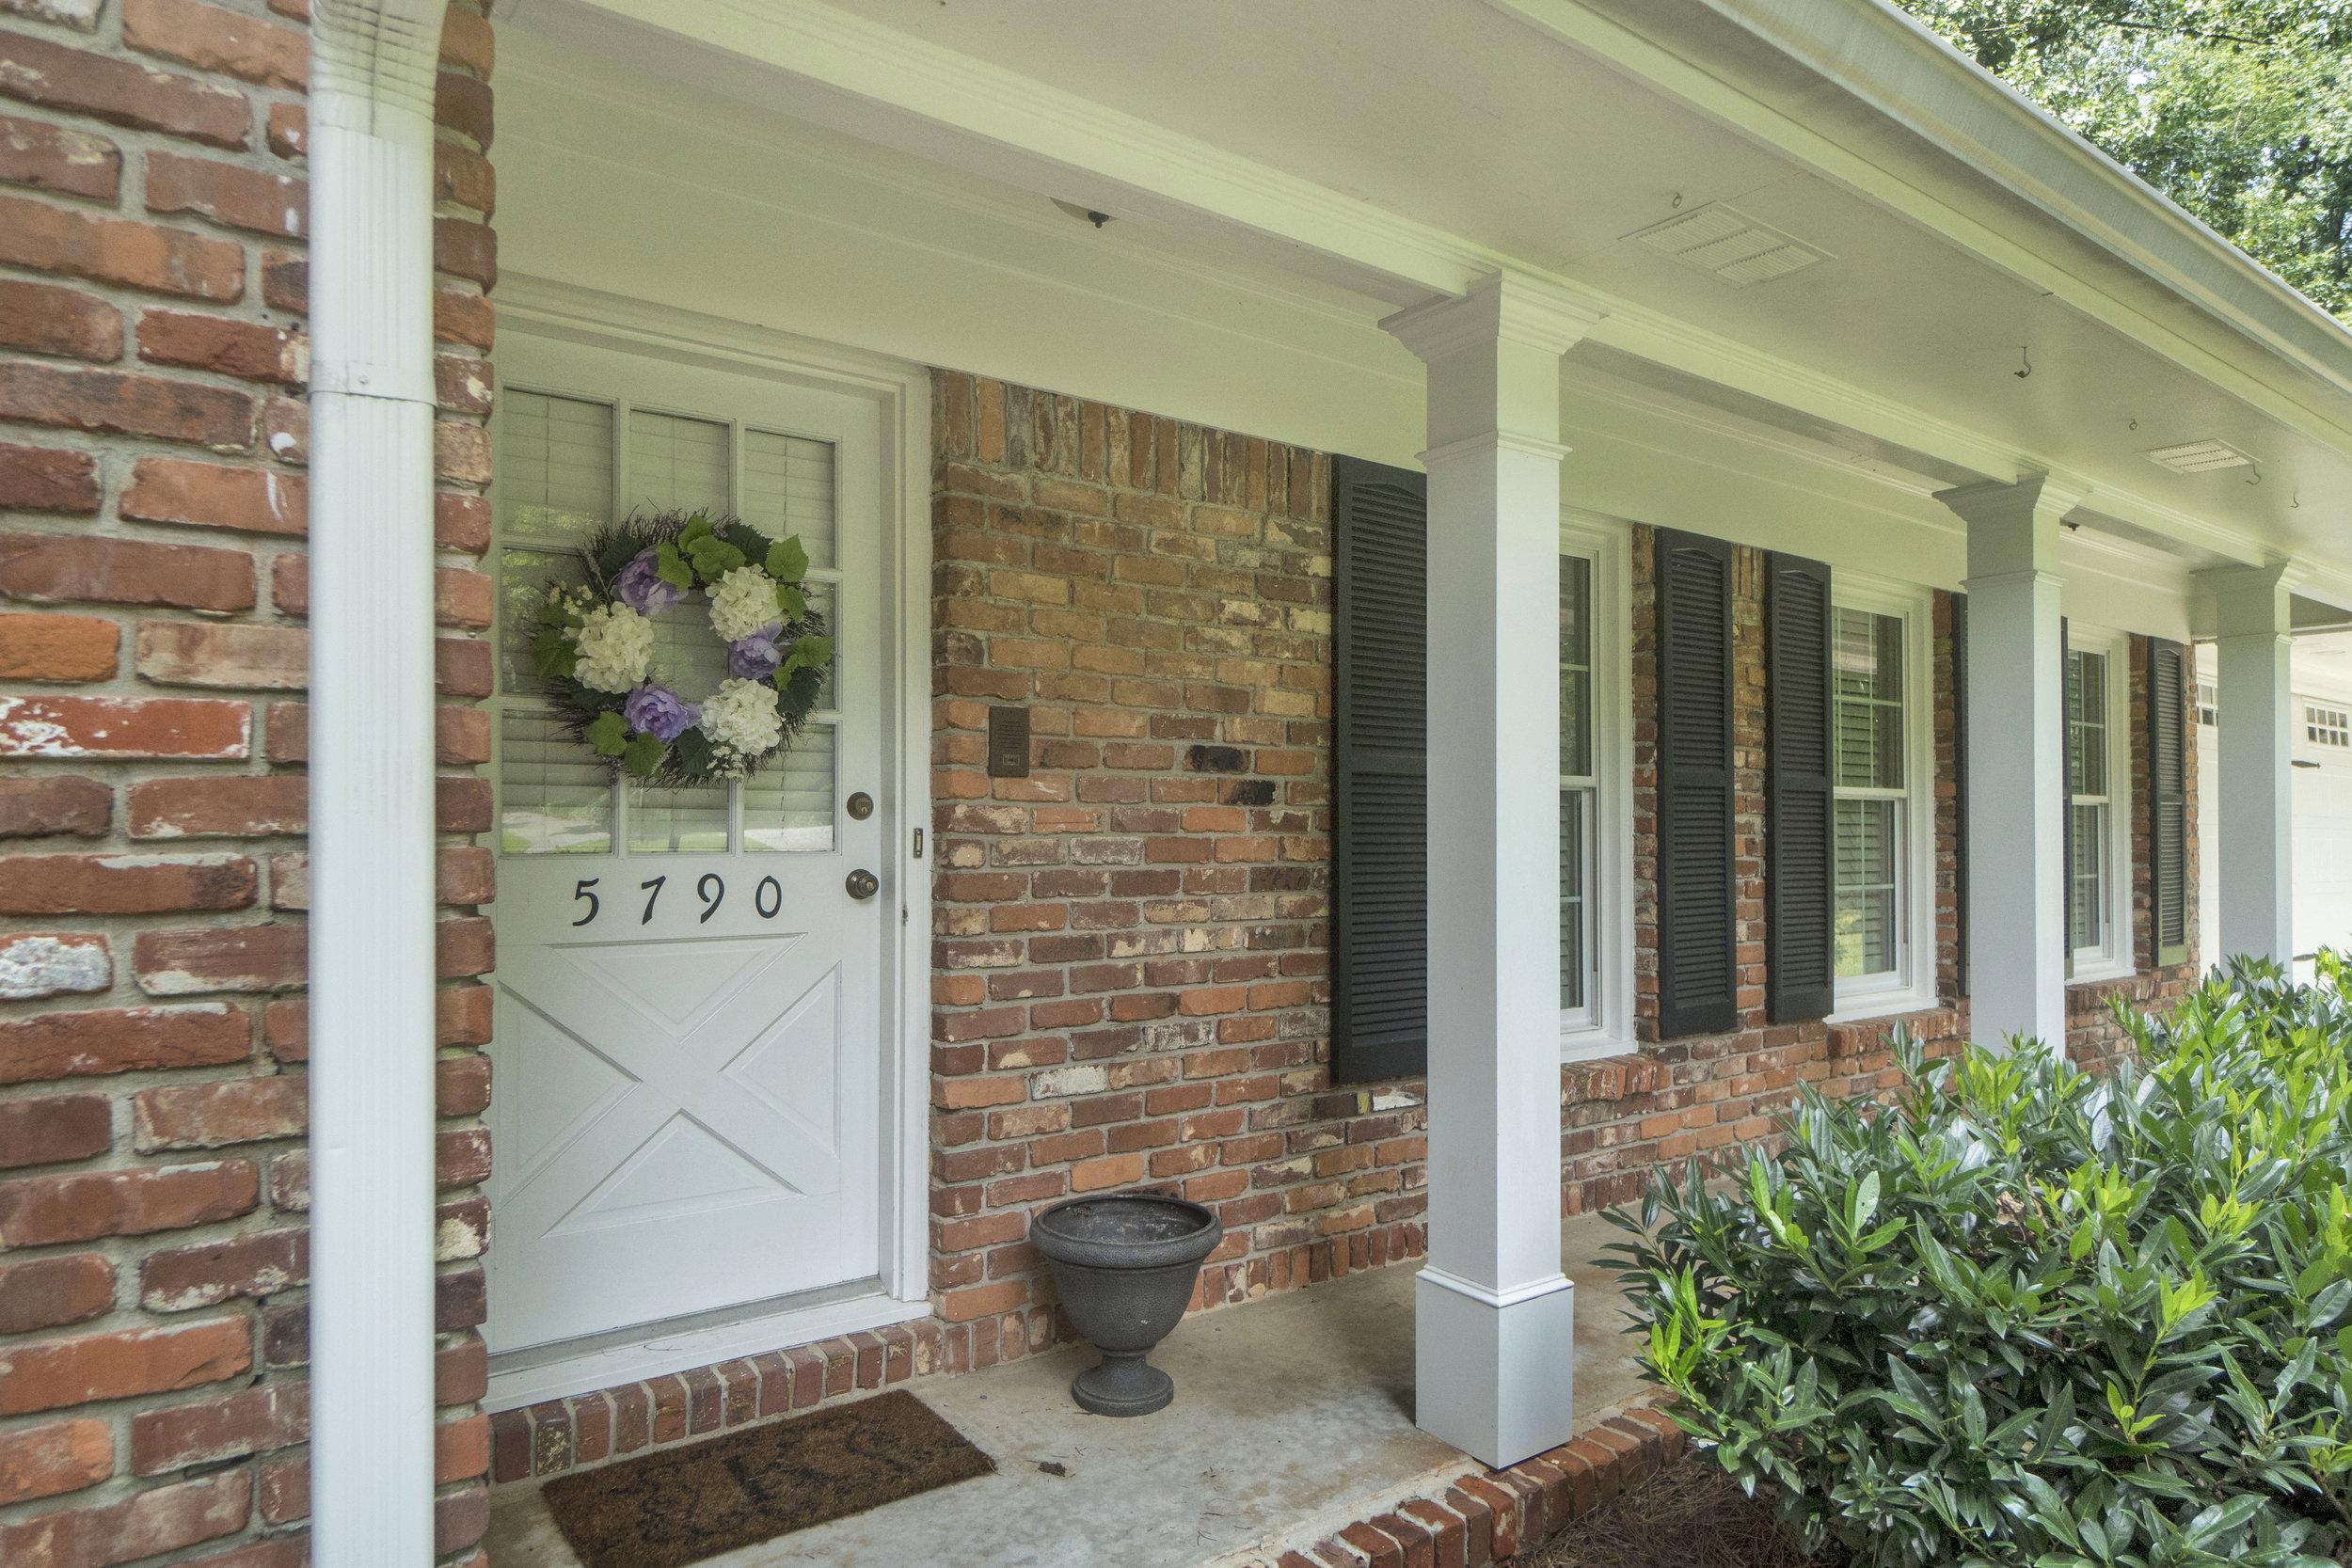 Atlanta GA Real Estate Photographer